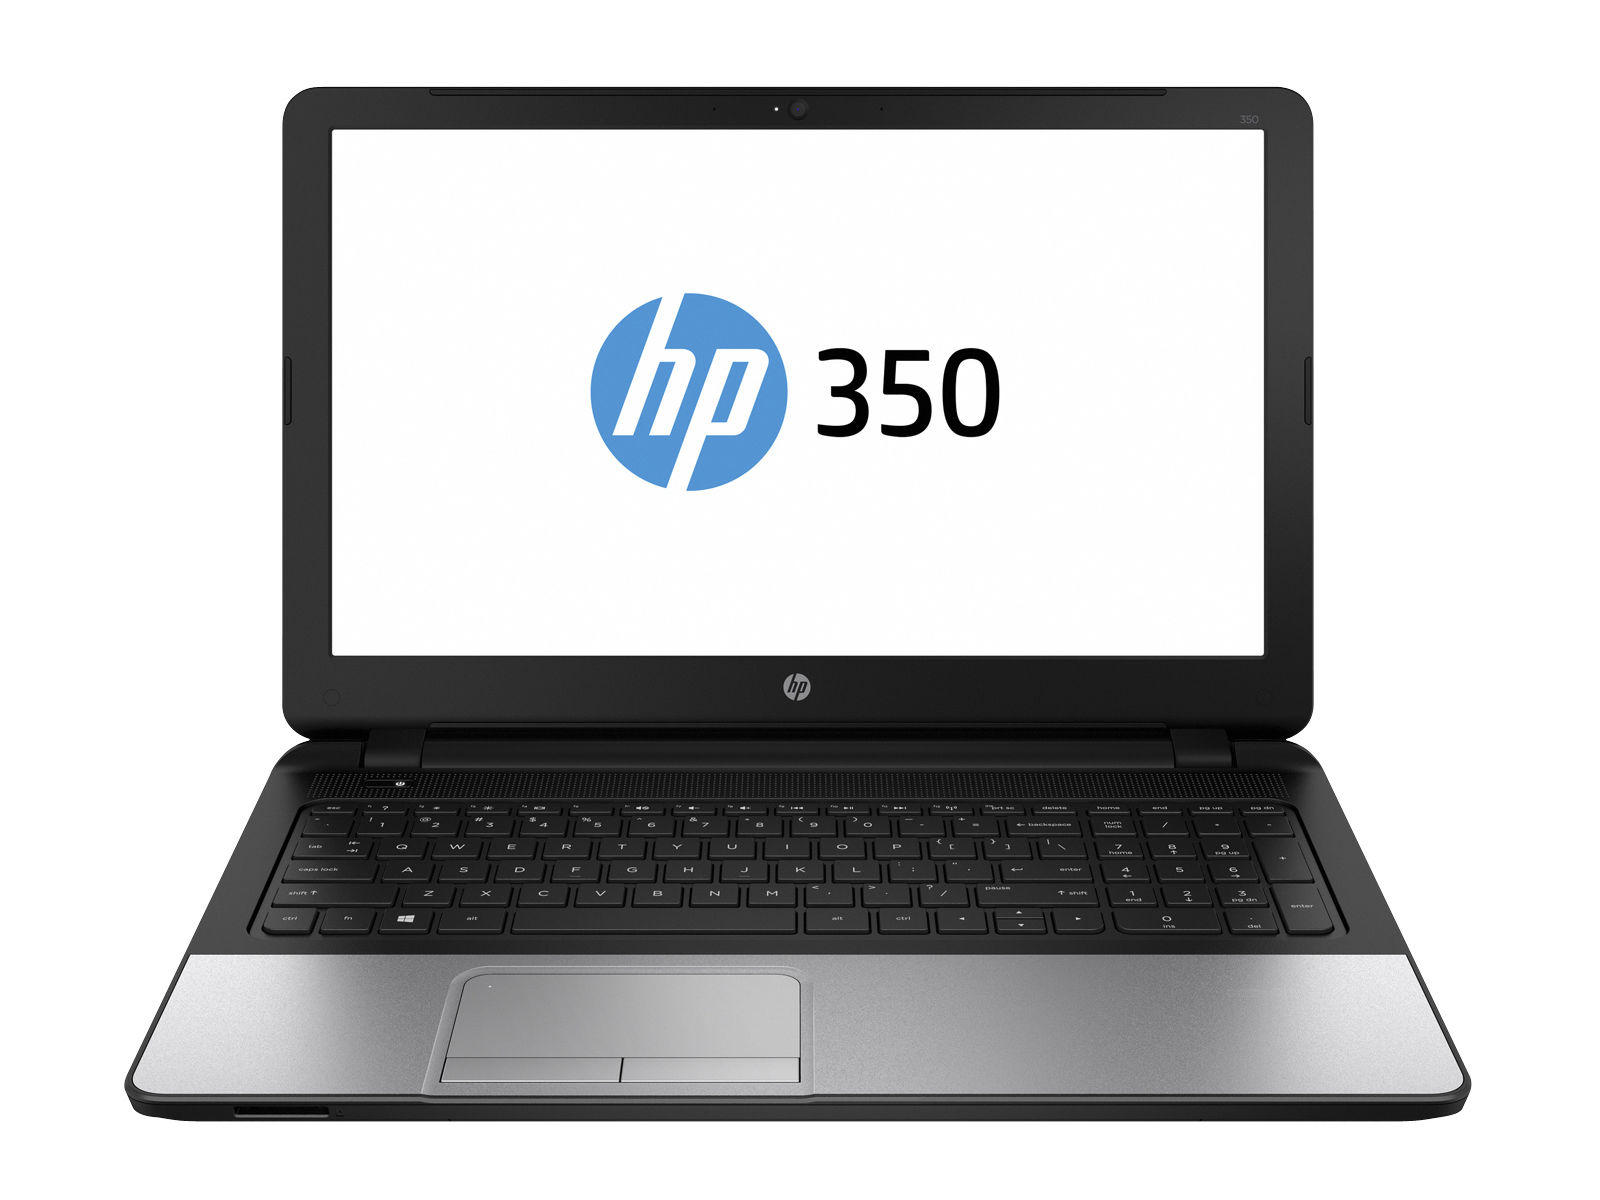 Laptop Notebook HP 350 G2 / INTEL Pentium Dual / 4GB RAM / 500GB HDD / INTEL HD